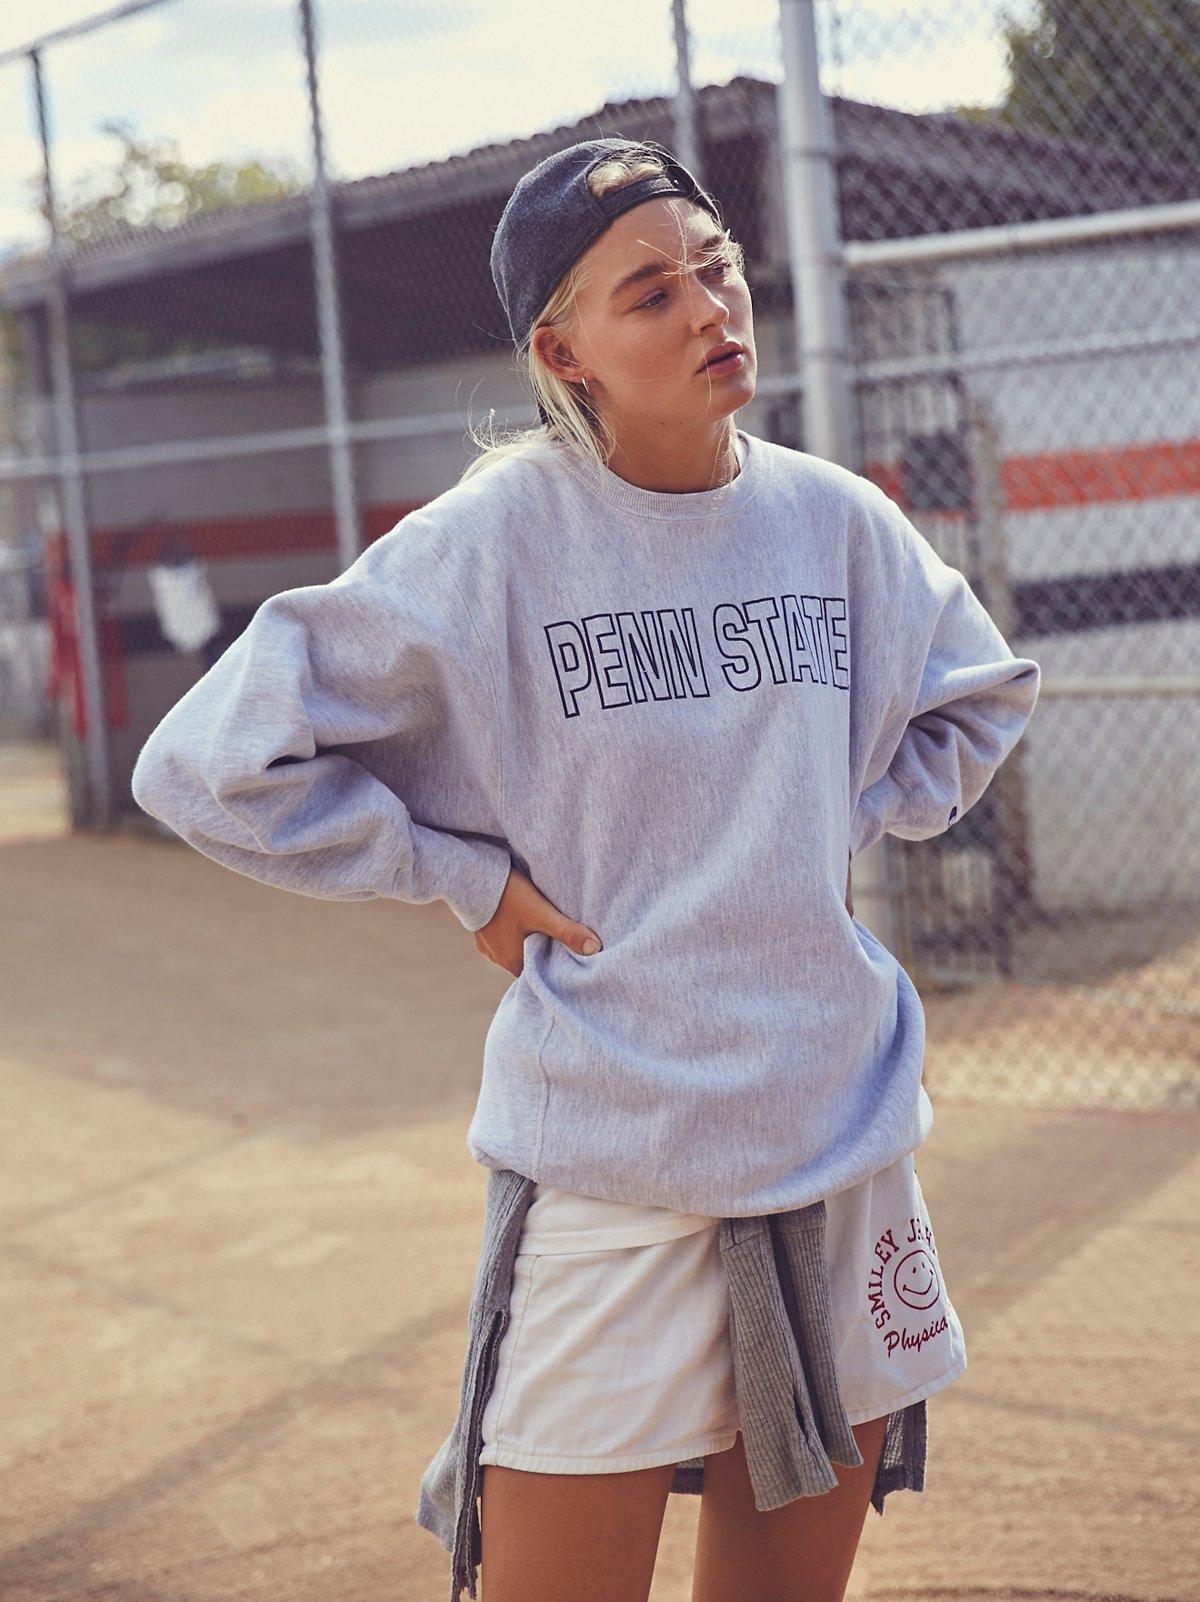 Vintage 1990s Penn State Sweatshirt